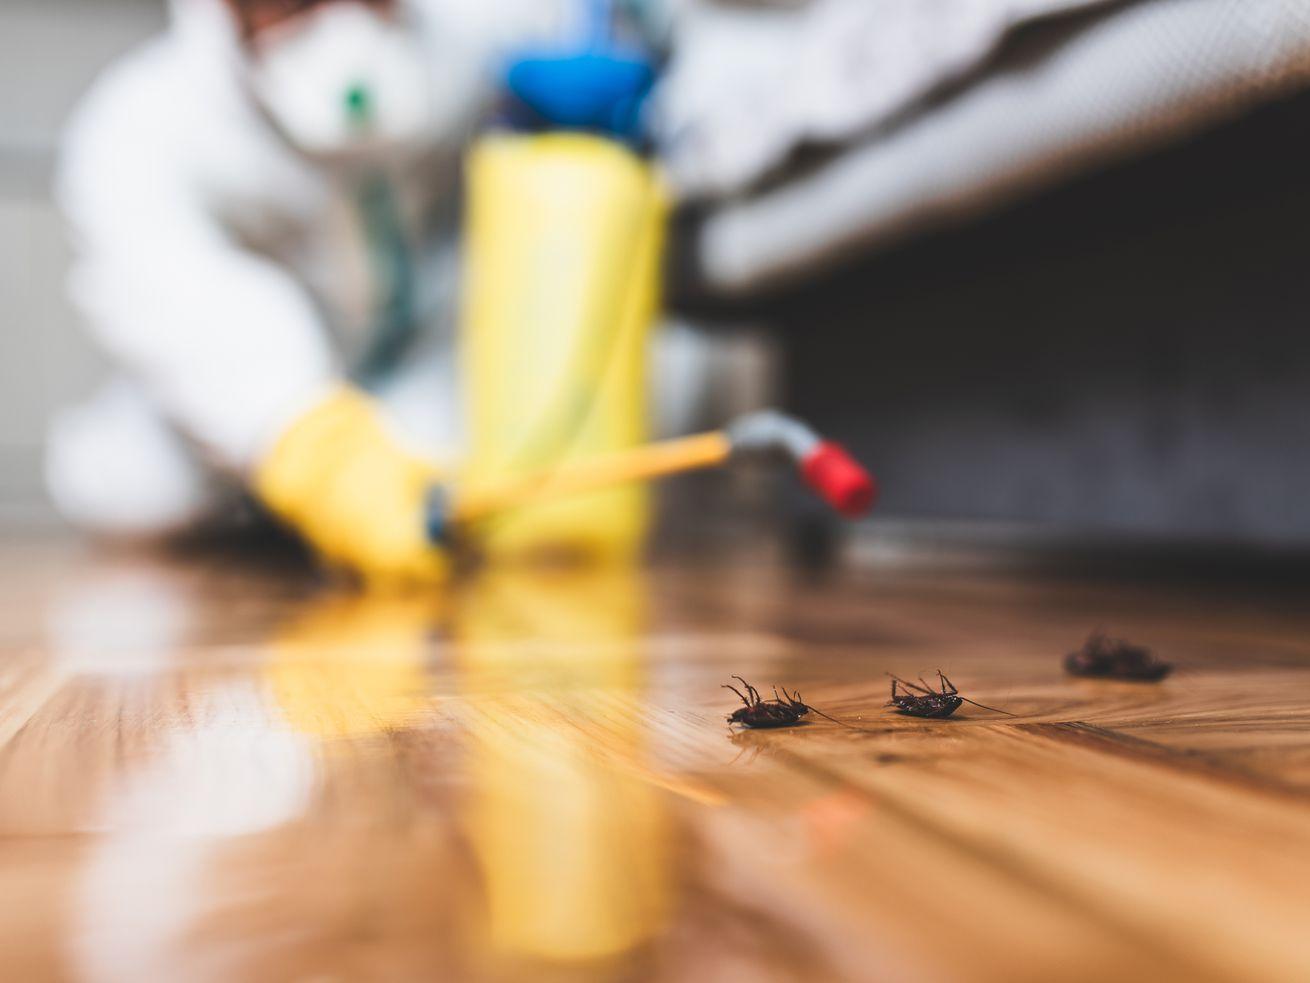 Orkin Vs Terminix Termite Control Household Pests Pest Control